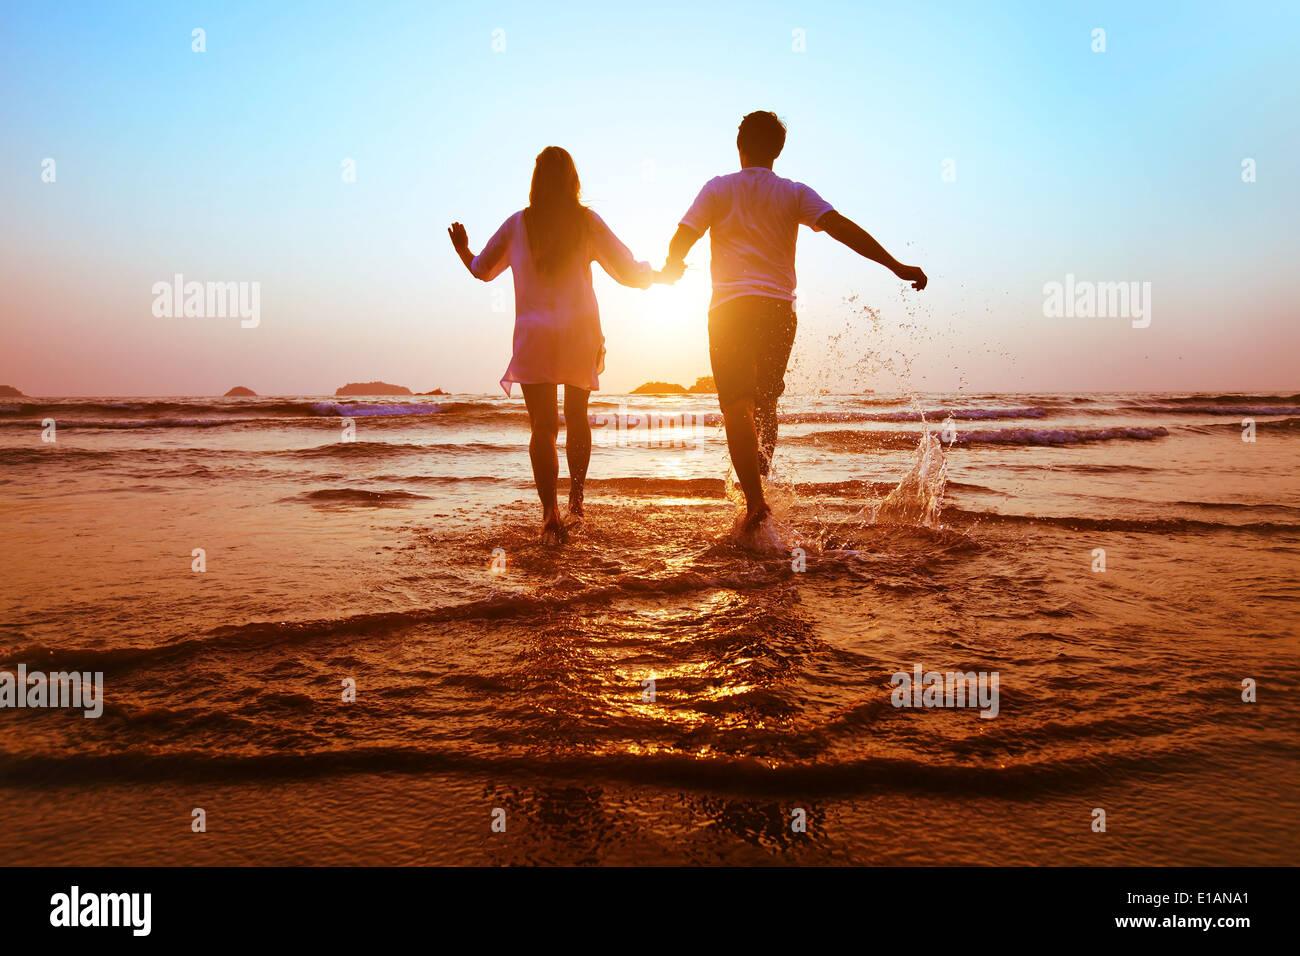 junge Brautpaar laufen ins Meer bei Sonnenuntergang Strand Stockbild